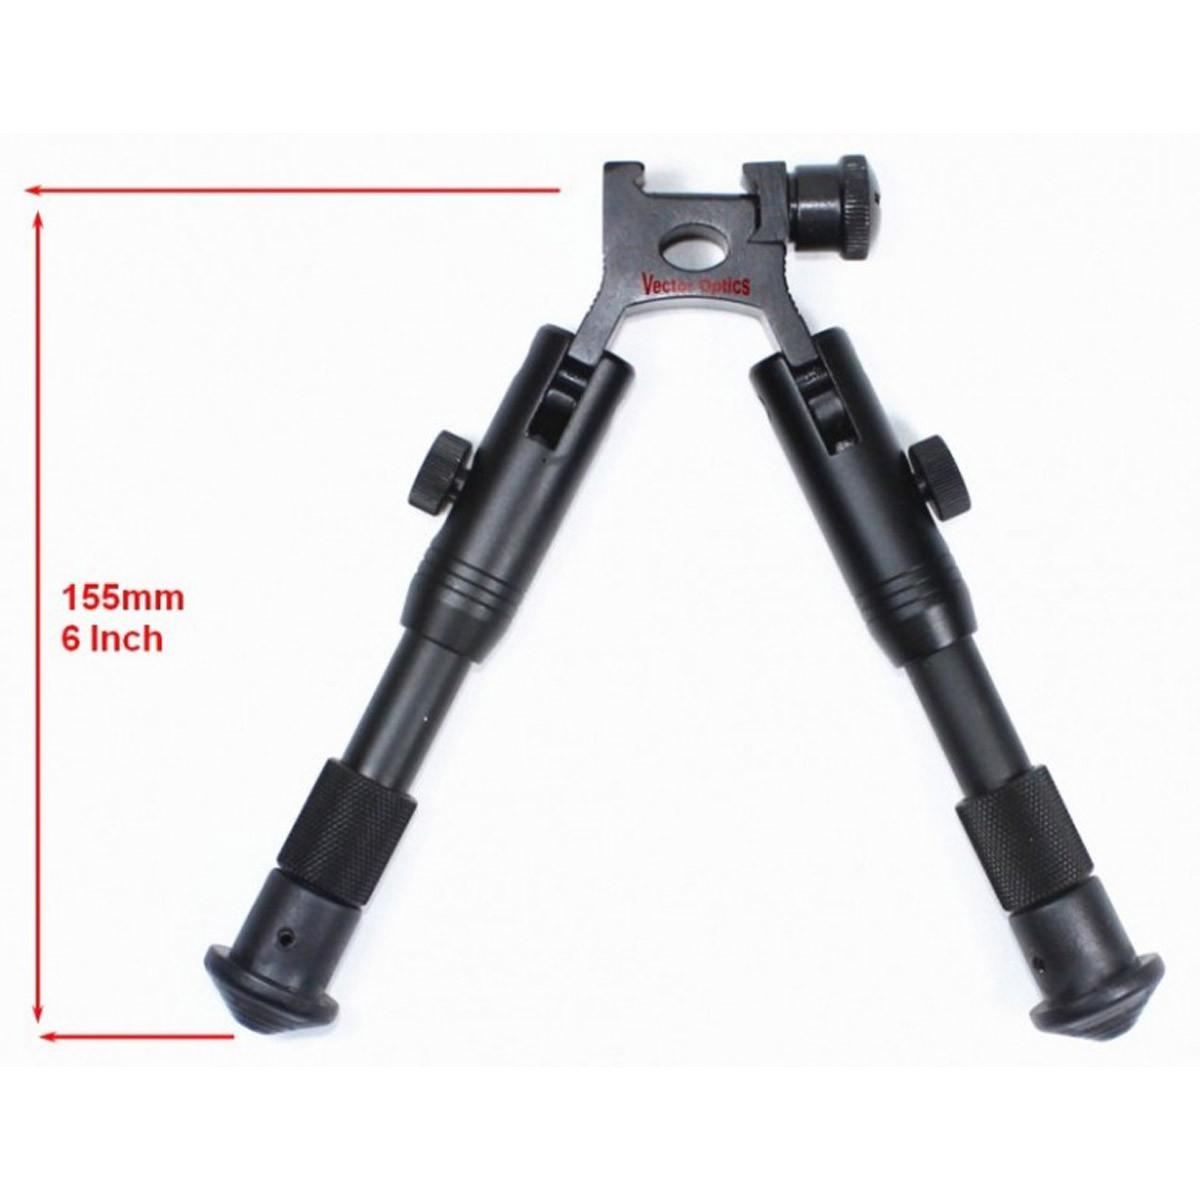 Universal Pistol Bipod 6-6.5''